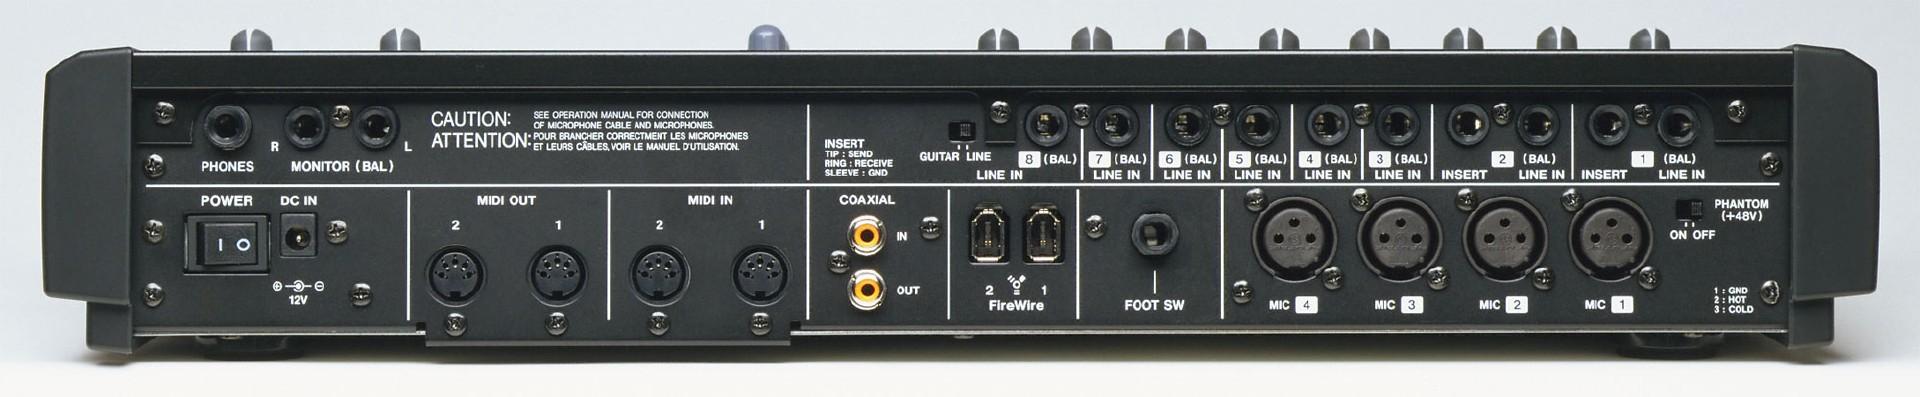 FW-1082 | FEATURES | TASCAM | International Website| | FEATURES